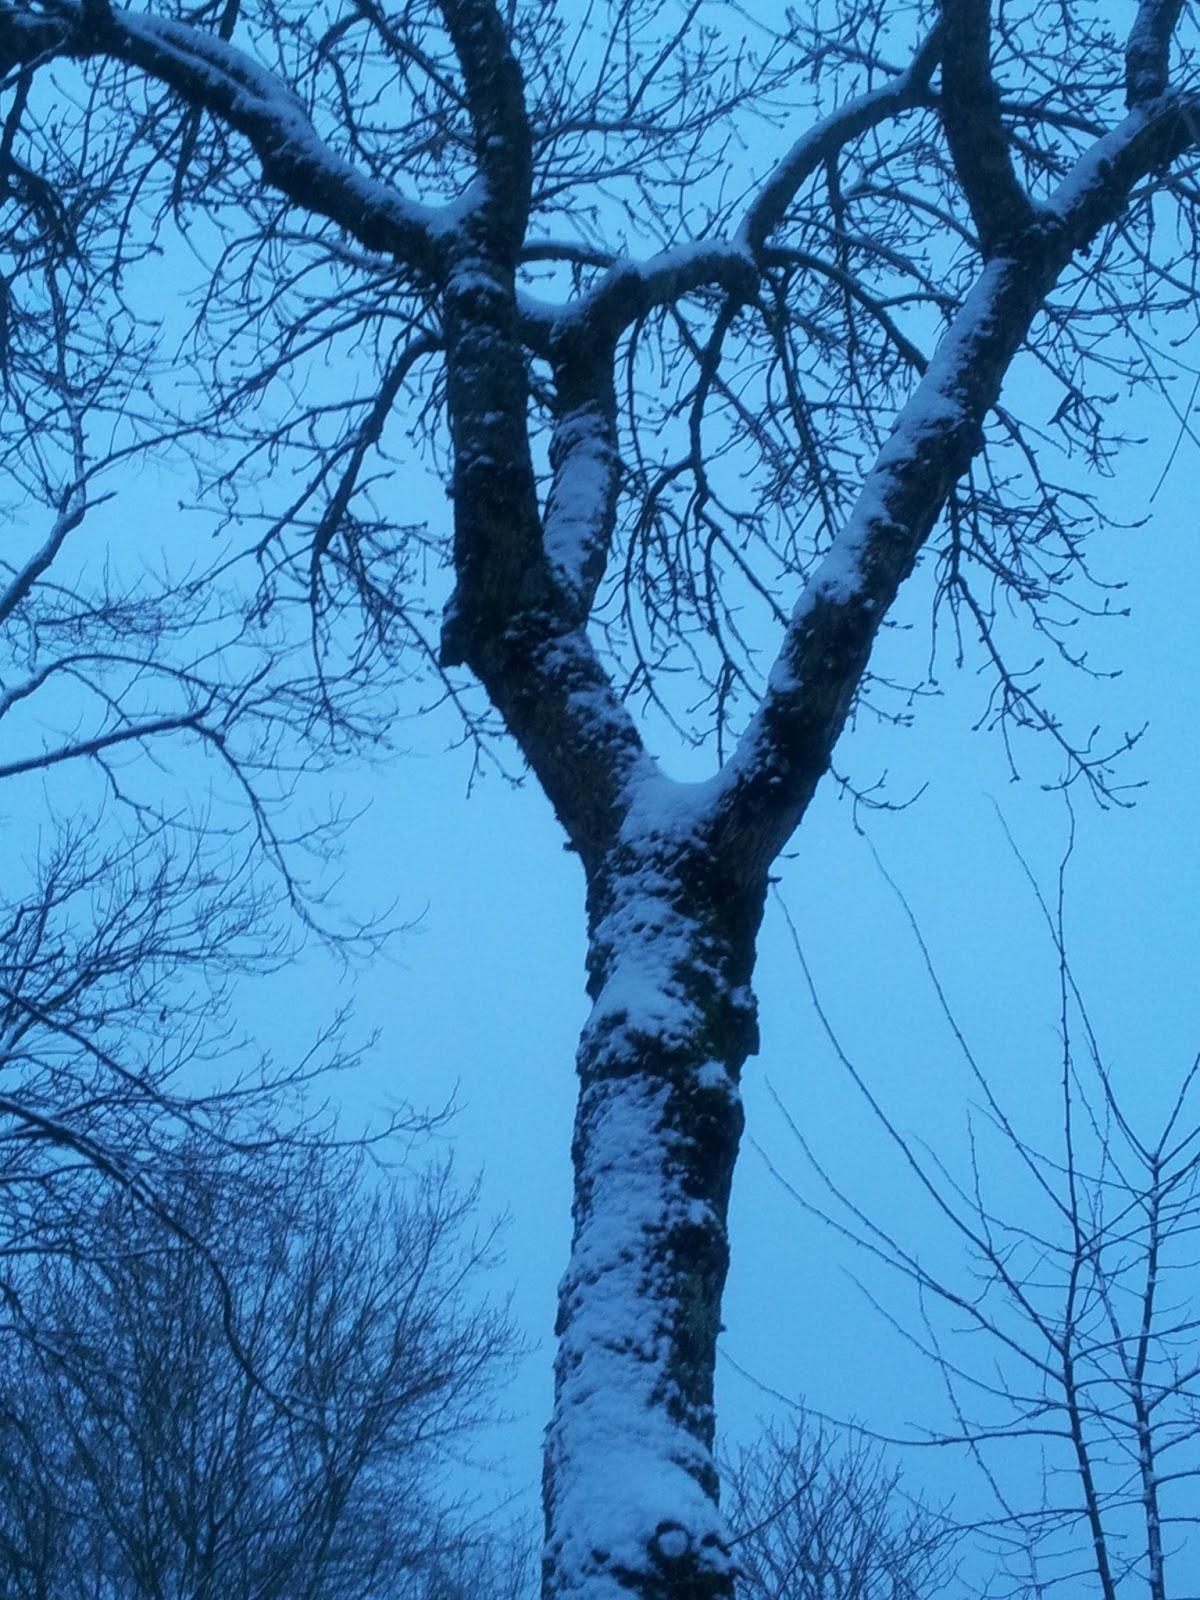 shiatsu passion fran oise couteron promenade tr s matinale sous la neige. Black Bedroom Furniture Sets. Home Design Ideas